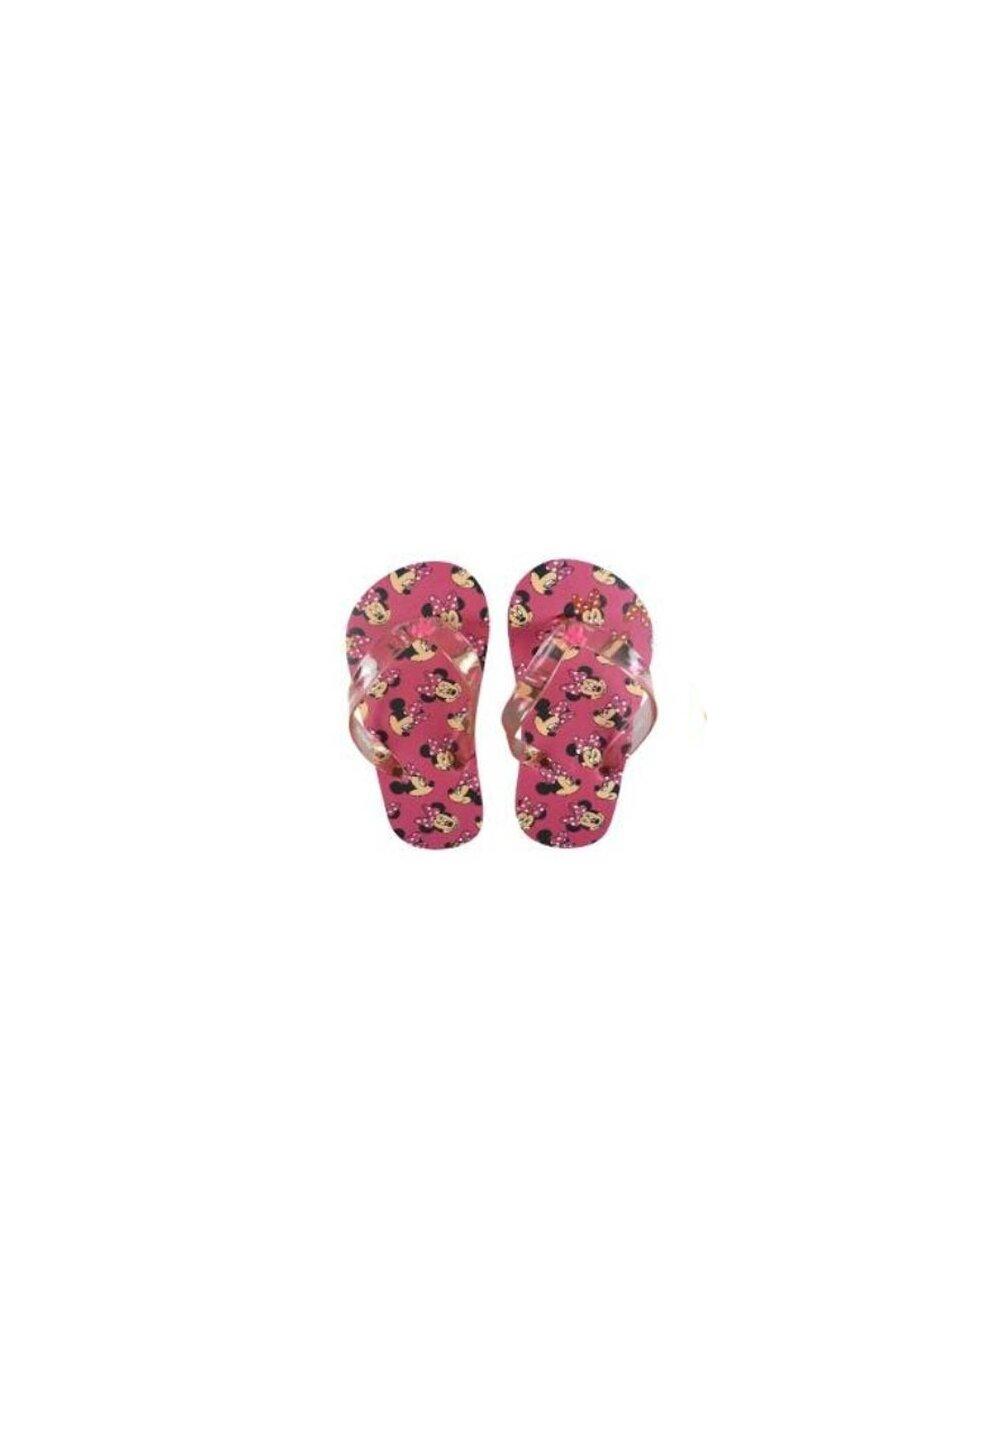 Papuci flip-flop, Minnie, roz cu figurine imagine